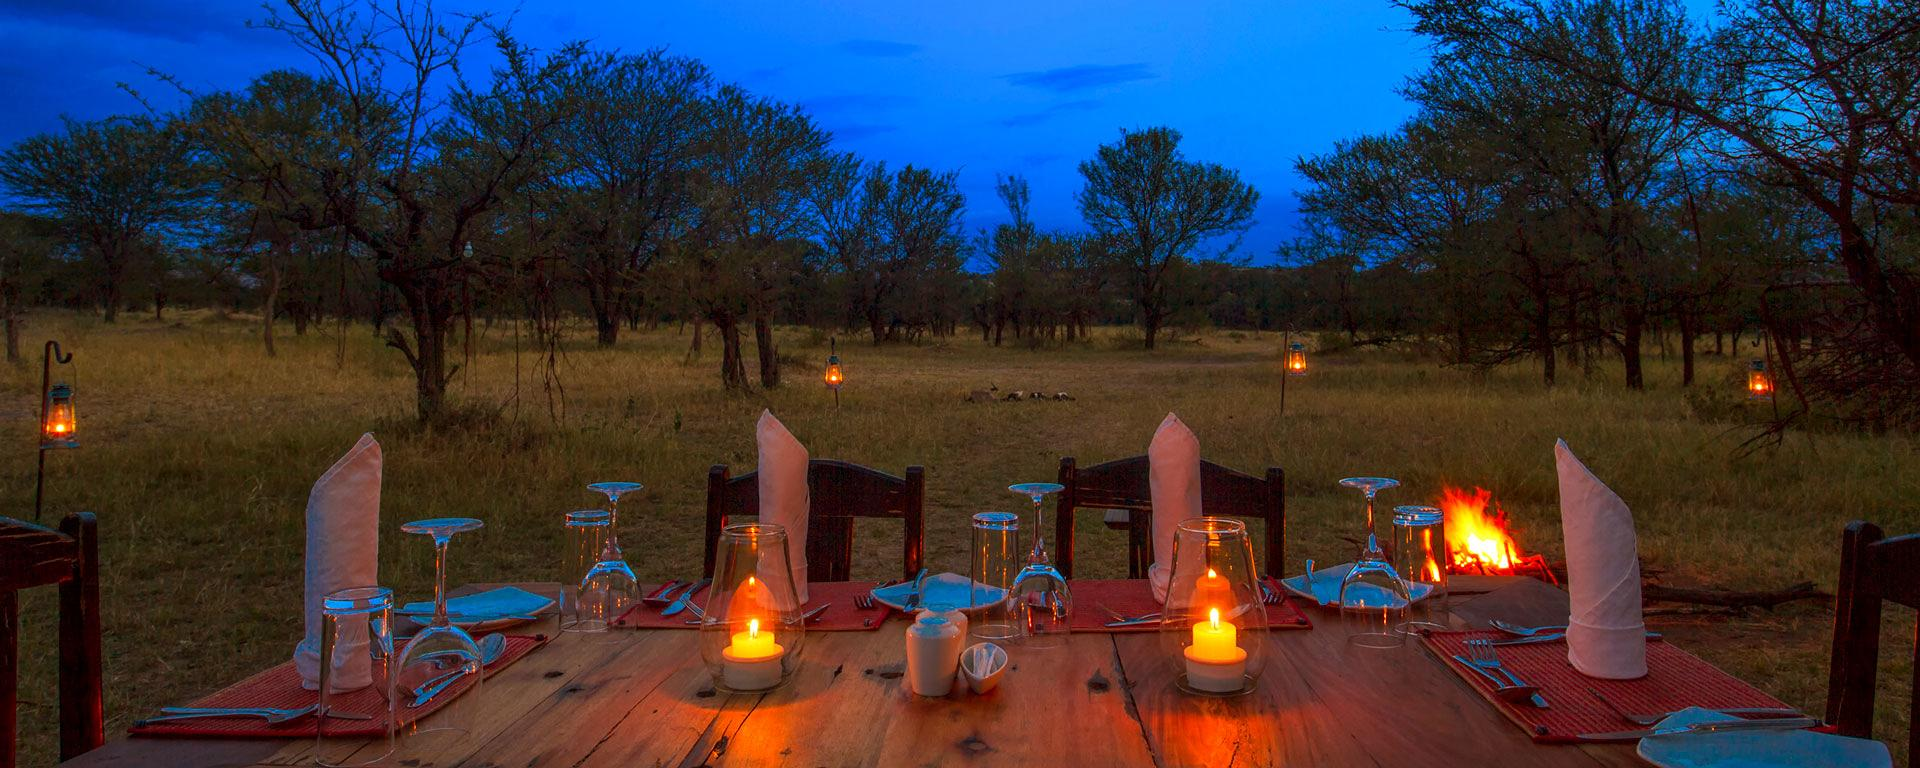 nasikia-mobile-migration-camp-safari